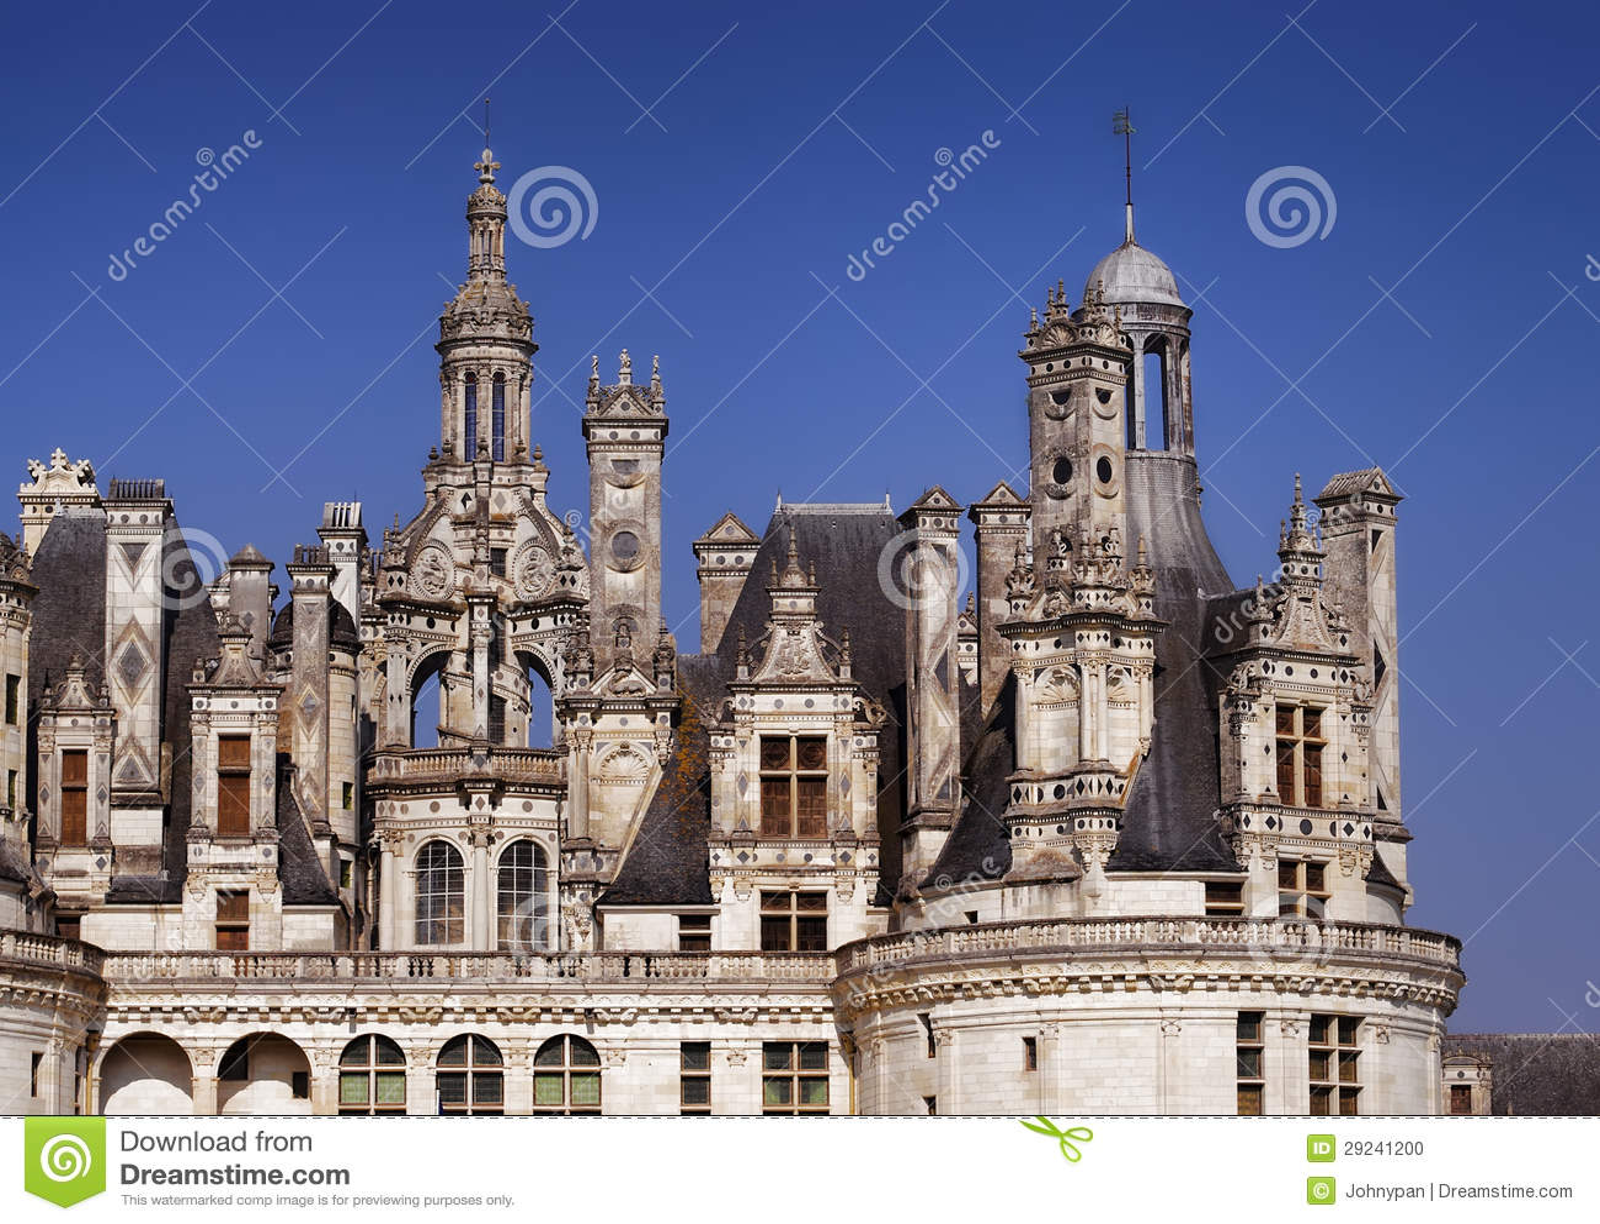 Castillo de chambord foto de archivo imagen de europa 29241200 - Castillo de chambord ...